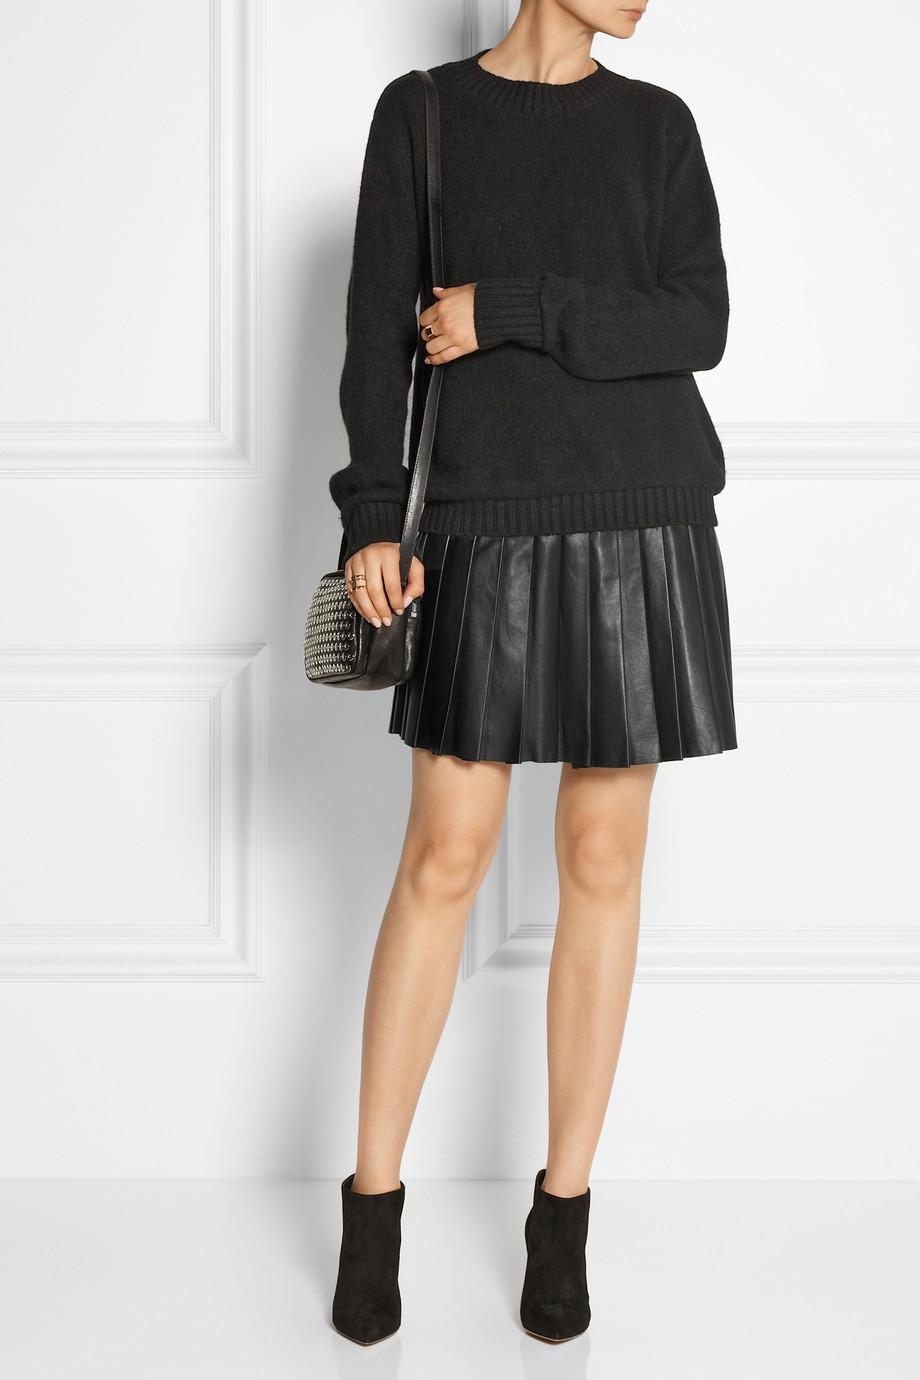 Belstaff Kaddington Pleated Leather Mini Skirt in Black   Lyst